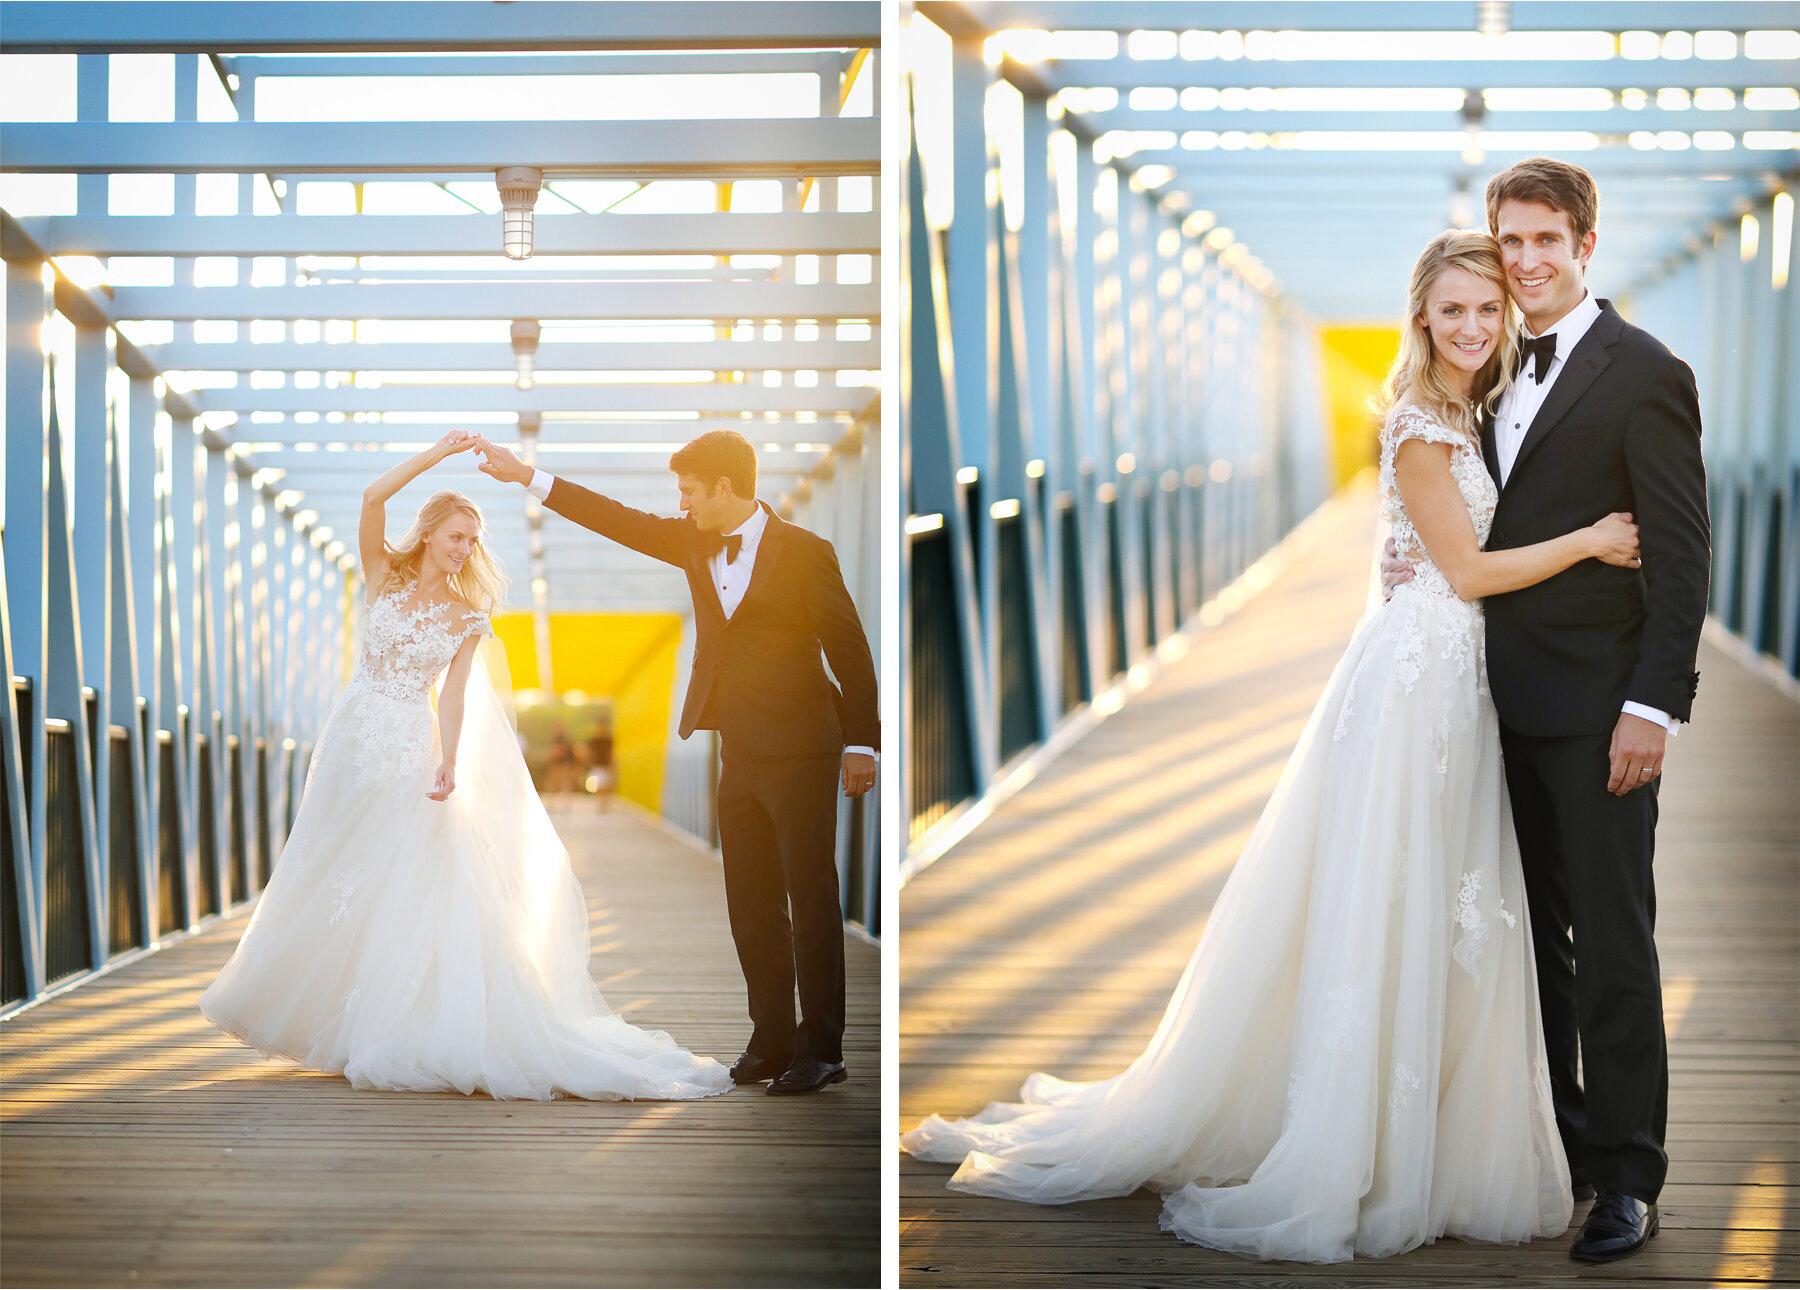 17 Wedding Vick Photography Minneapolis Minnesota Bride Groom Blue Bridge Sunset Michelle and William.jpg